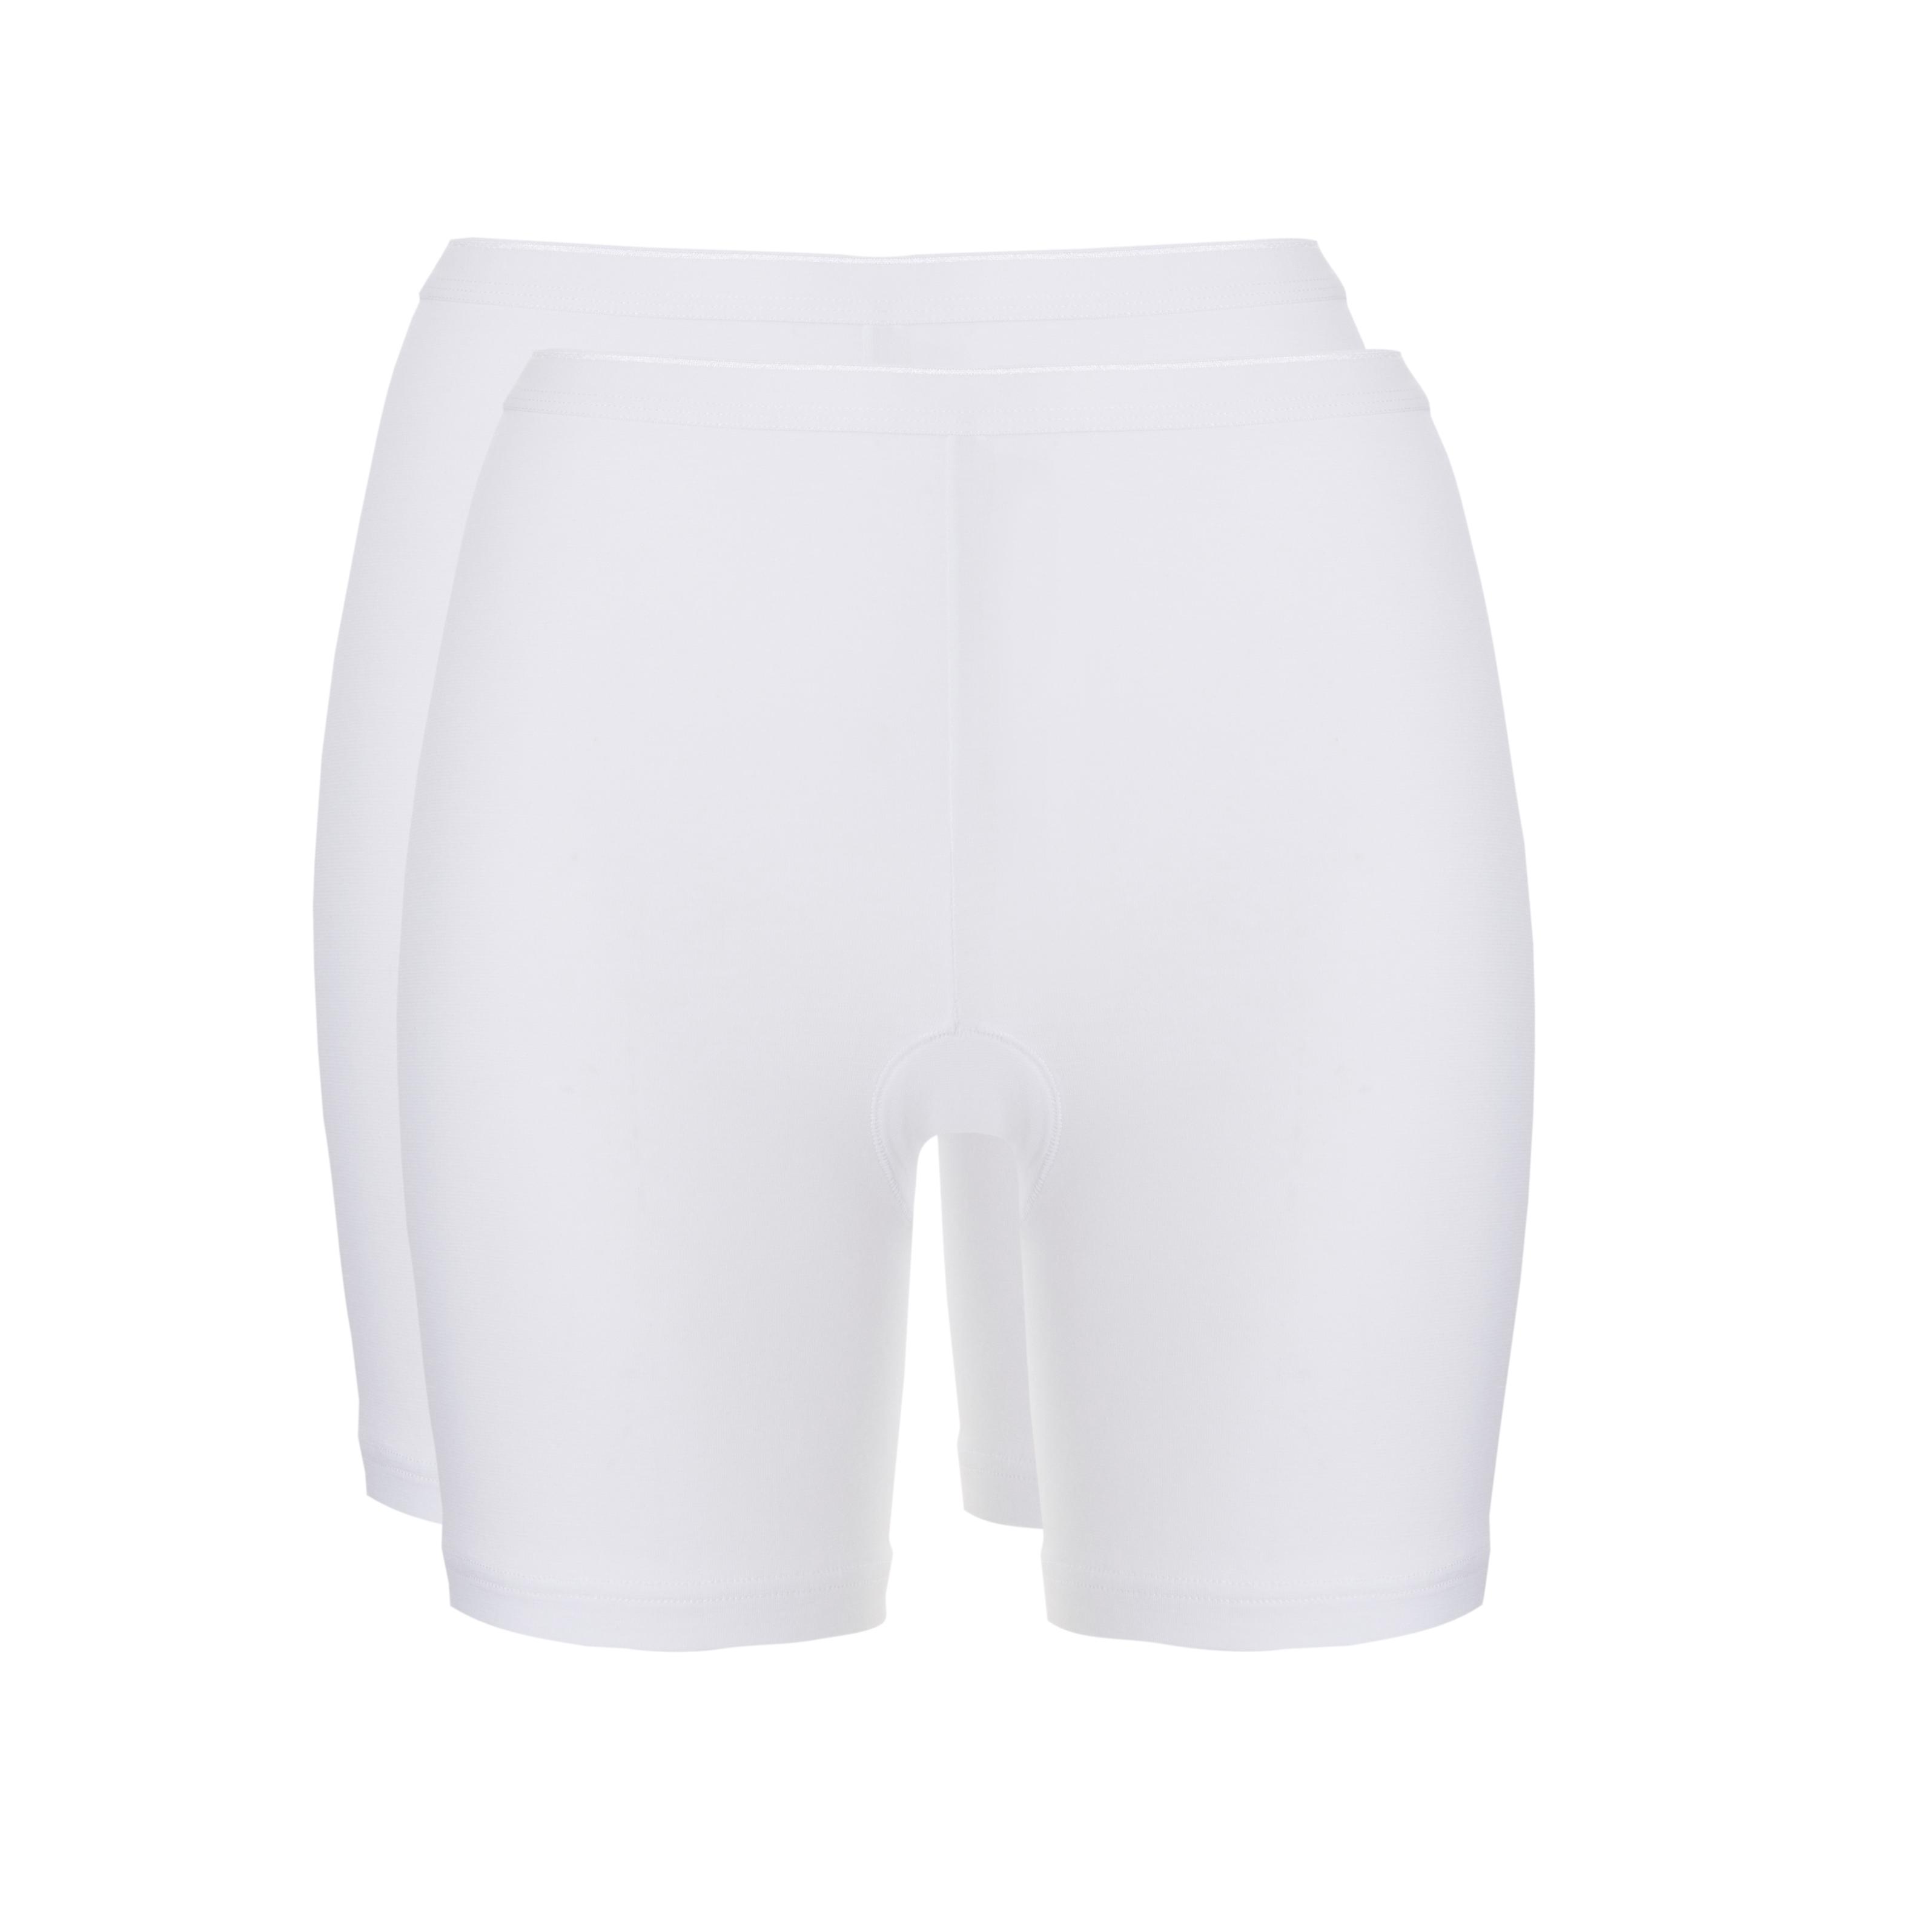 Ten Cate Basic Women Cotton Pants 2-pack Wit